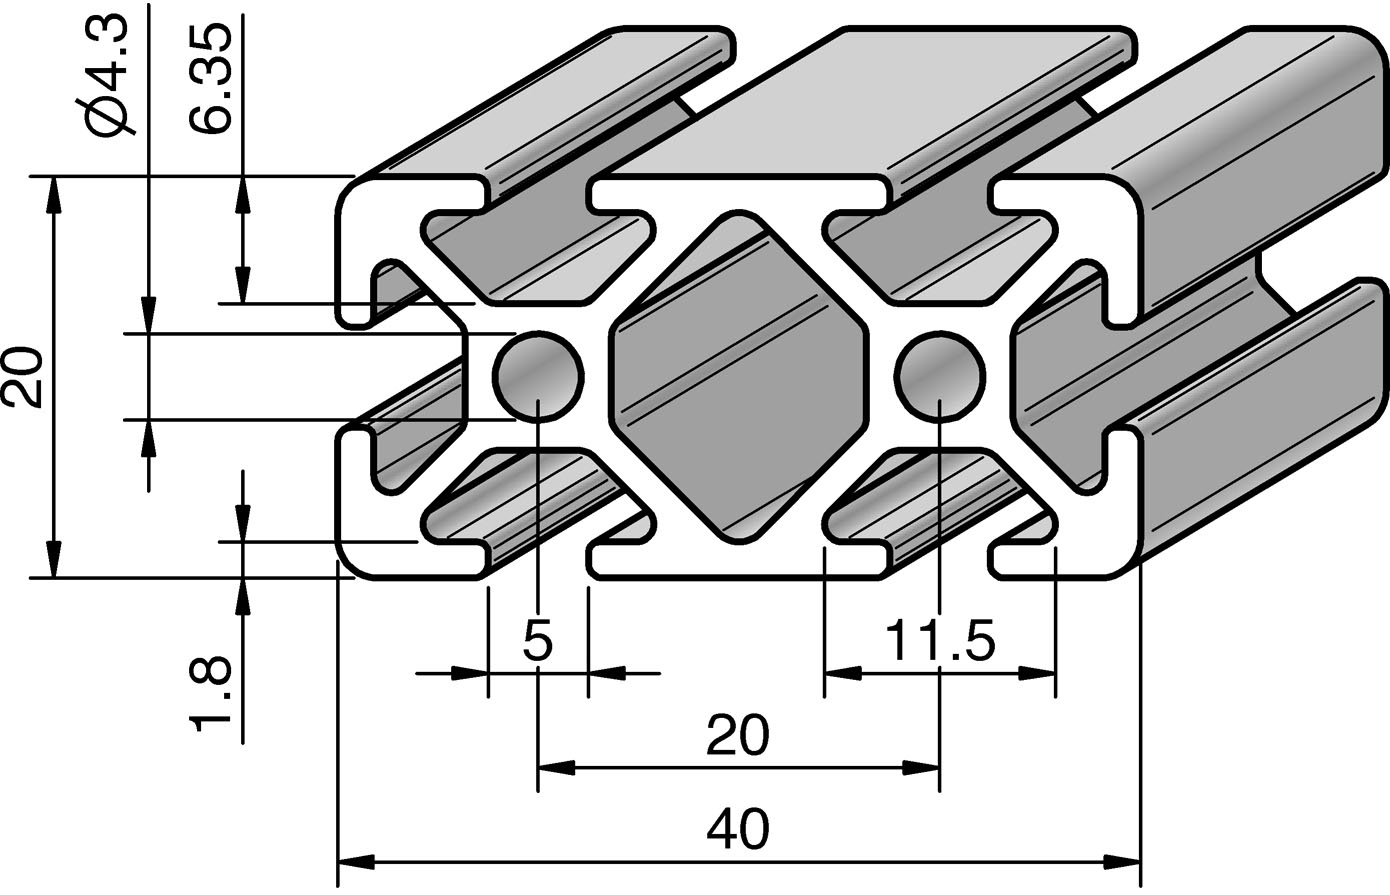 profil 5 40x20 alv ris pro le systems. Black Bedroom Furniture Sets. Home Design Ideas